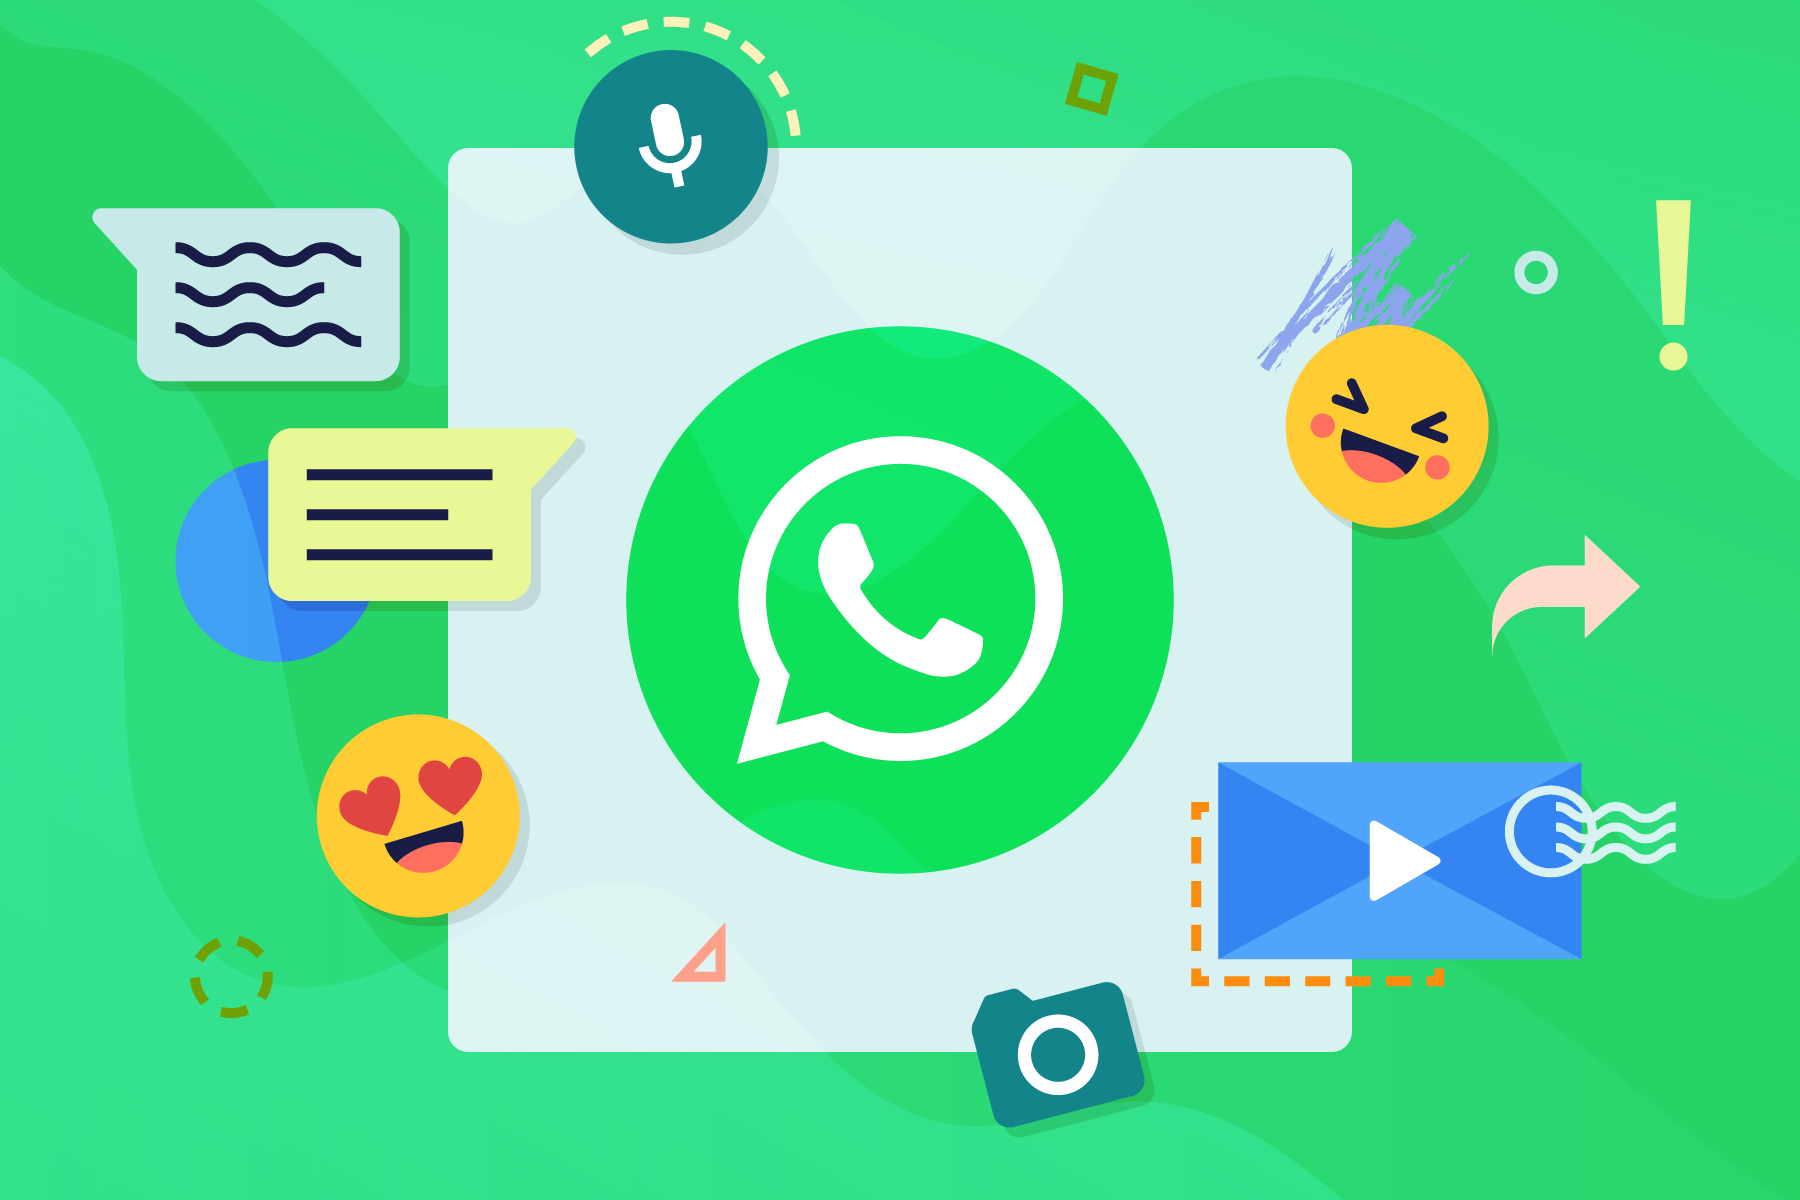 Choose video quality before sharing on Whatsapp